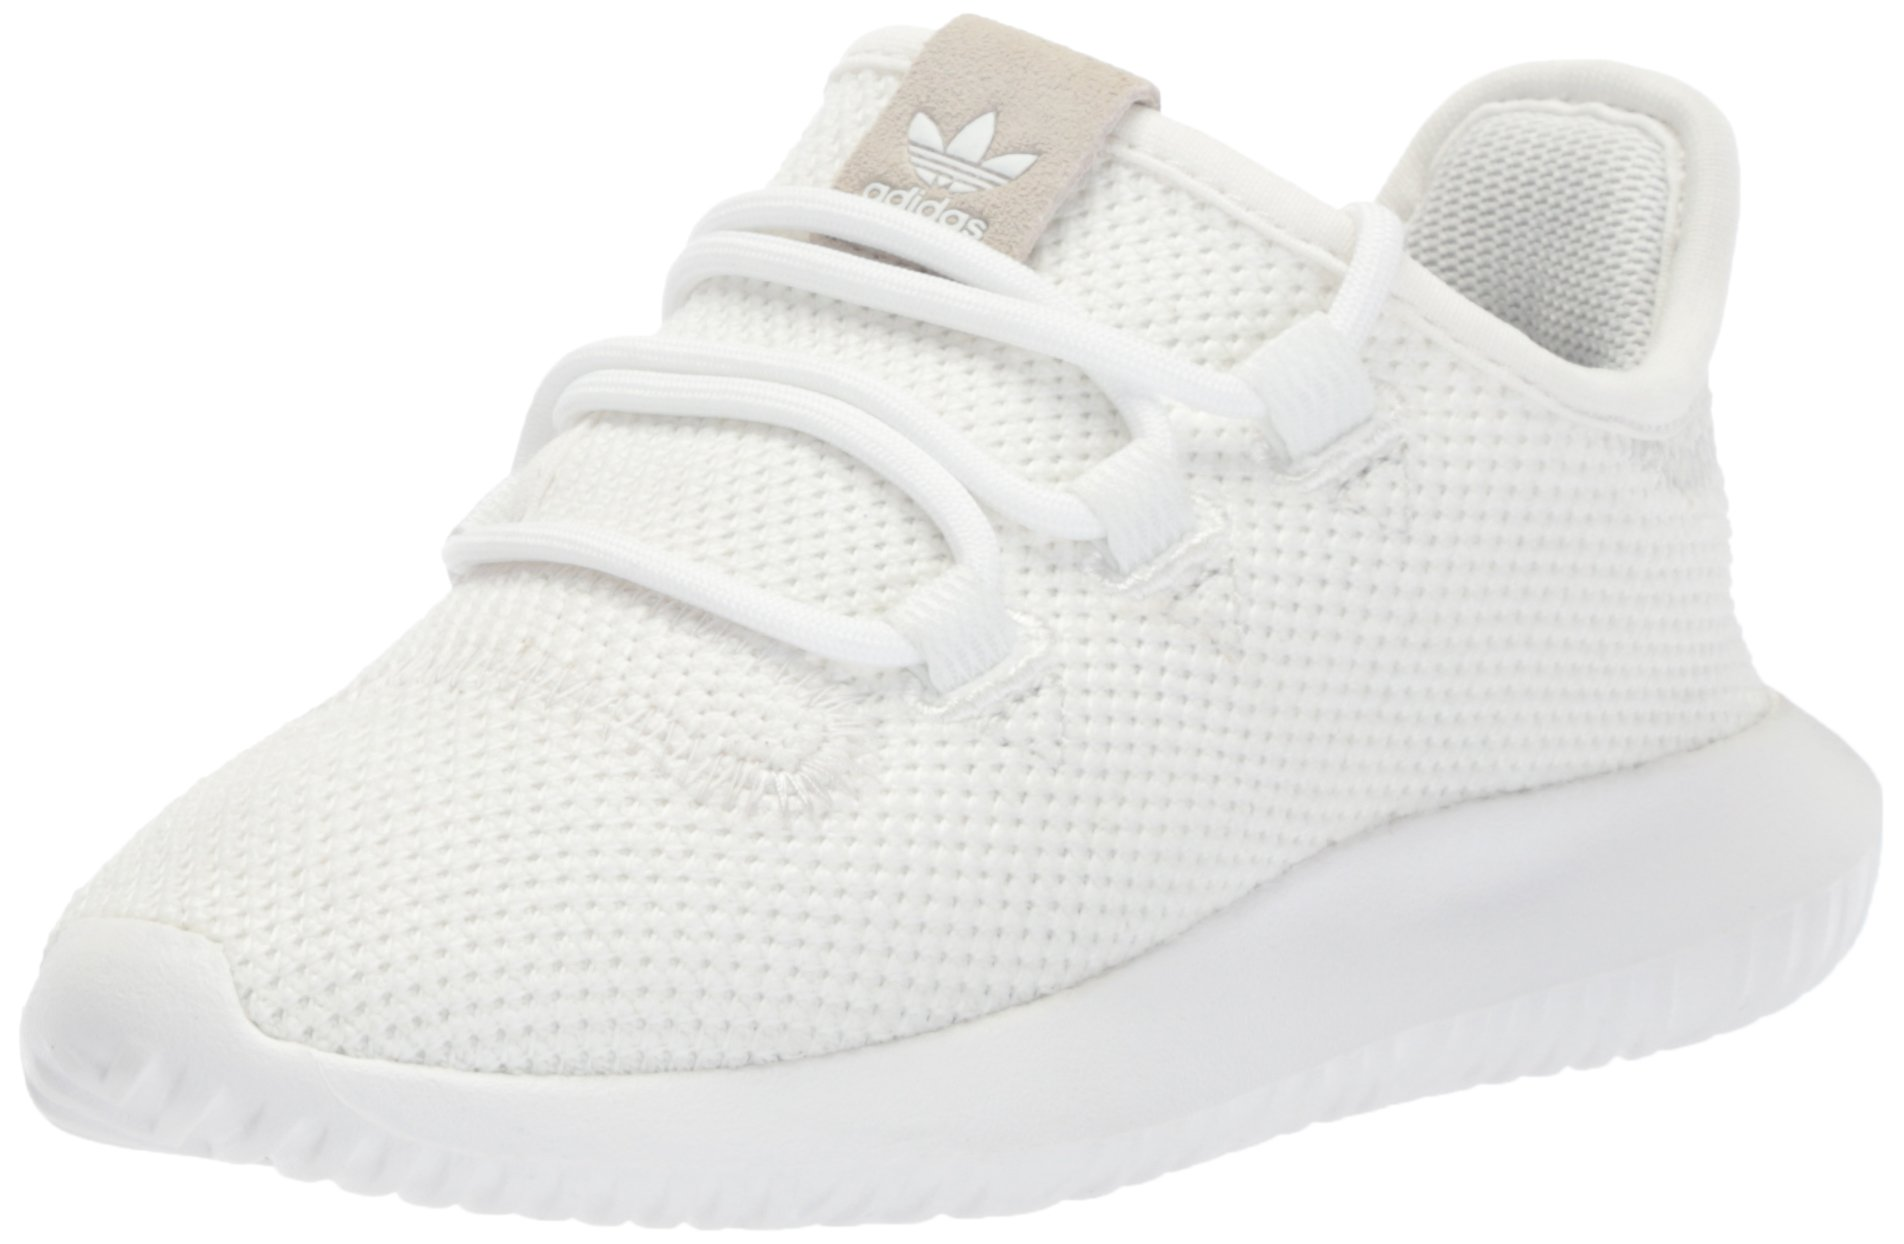 timeless design e6c8e 3d0e2 adidas Originals Boys' Tubular Shadow C Sneaker, White/Core Black/White, 2  M US Little Kid